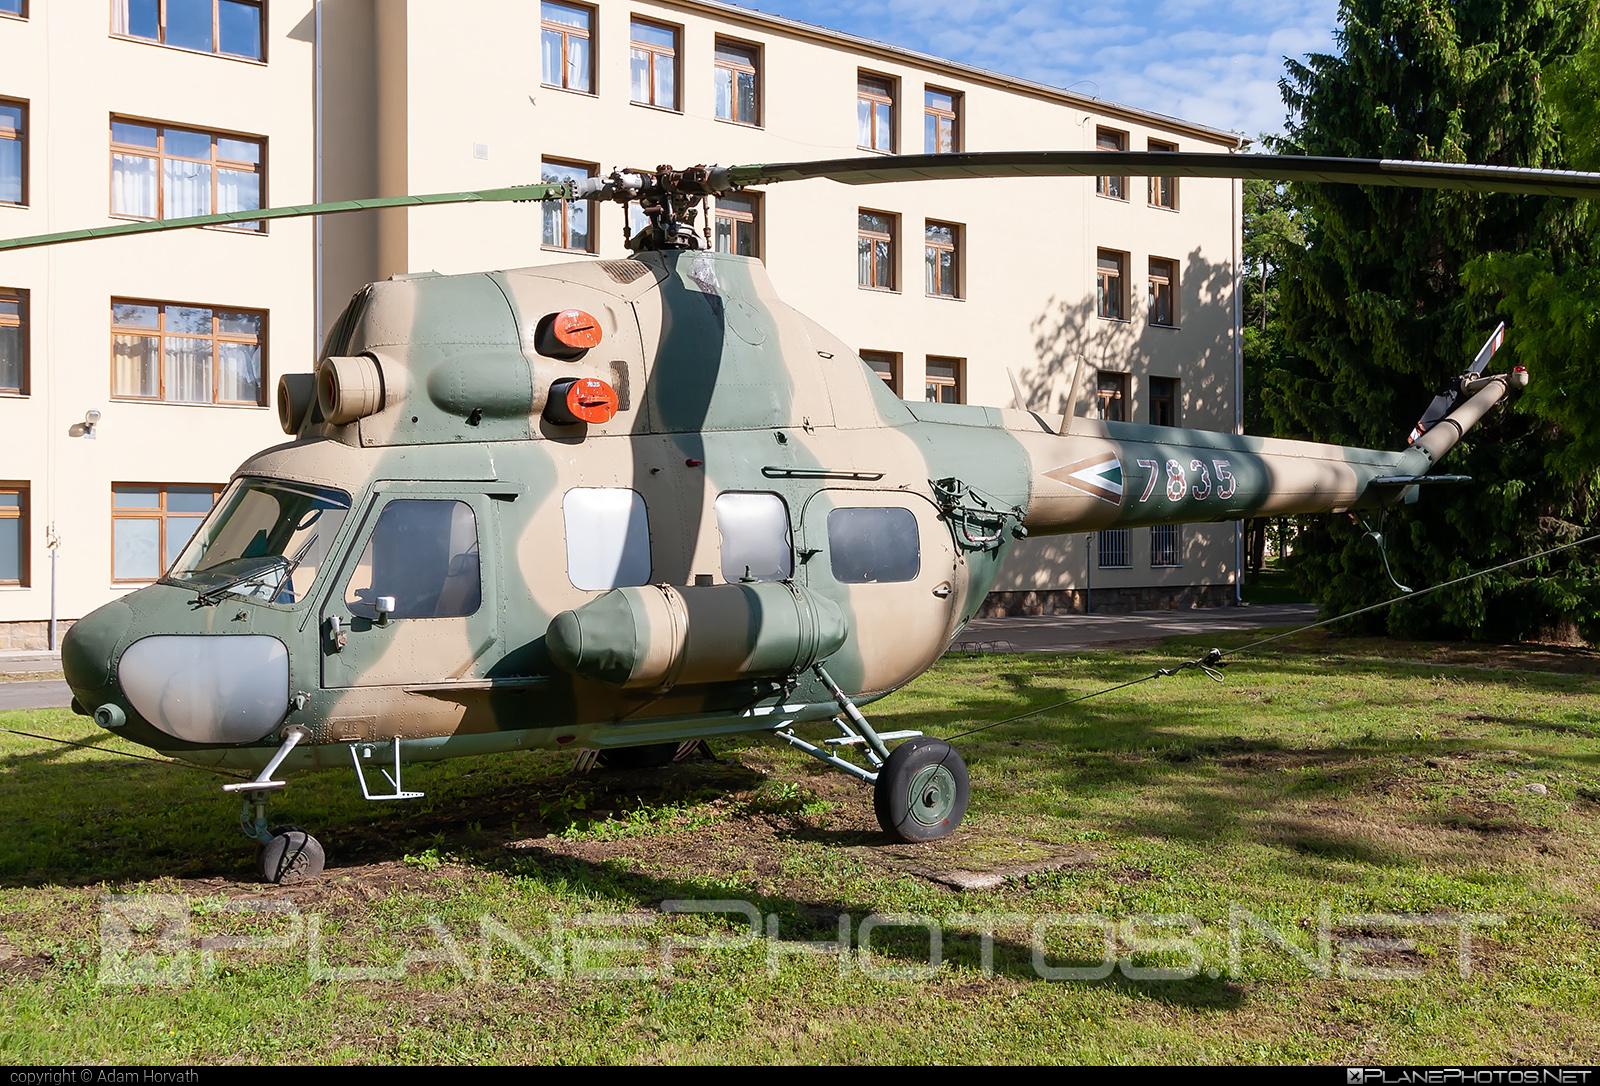 Mil Mi-2 - 7835 operated by Magyar Légierő (Hungarian Air Force) #hungarianairforce #magyarlegiero #mil #milhelicopters